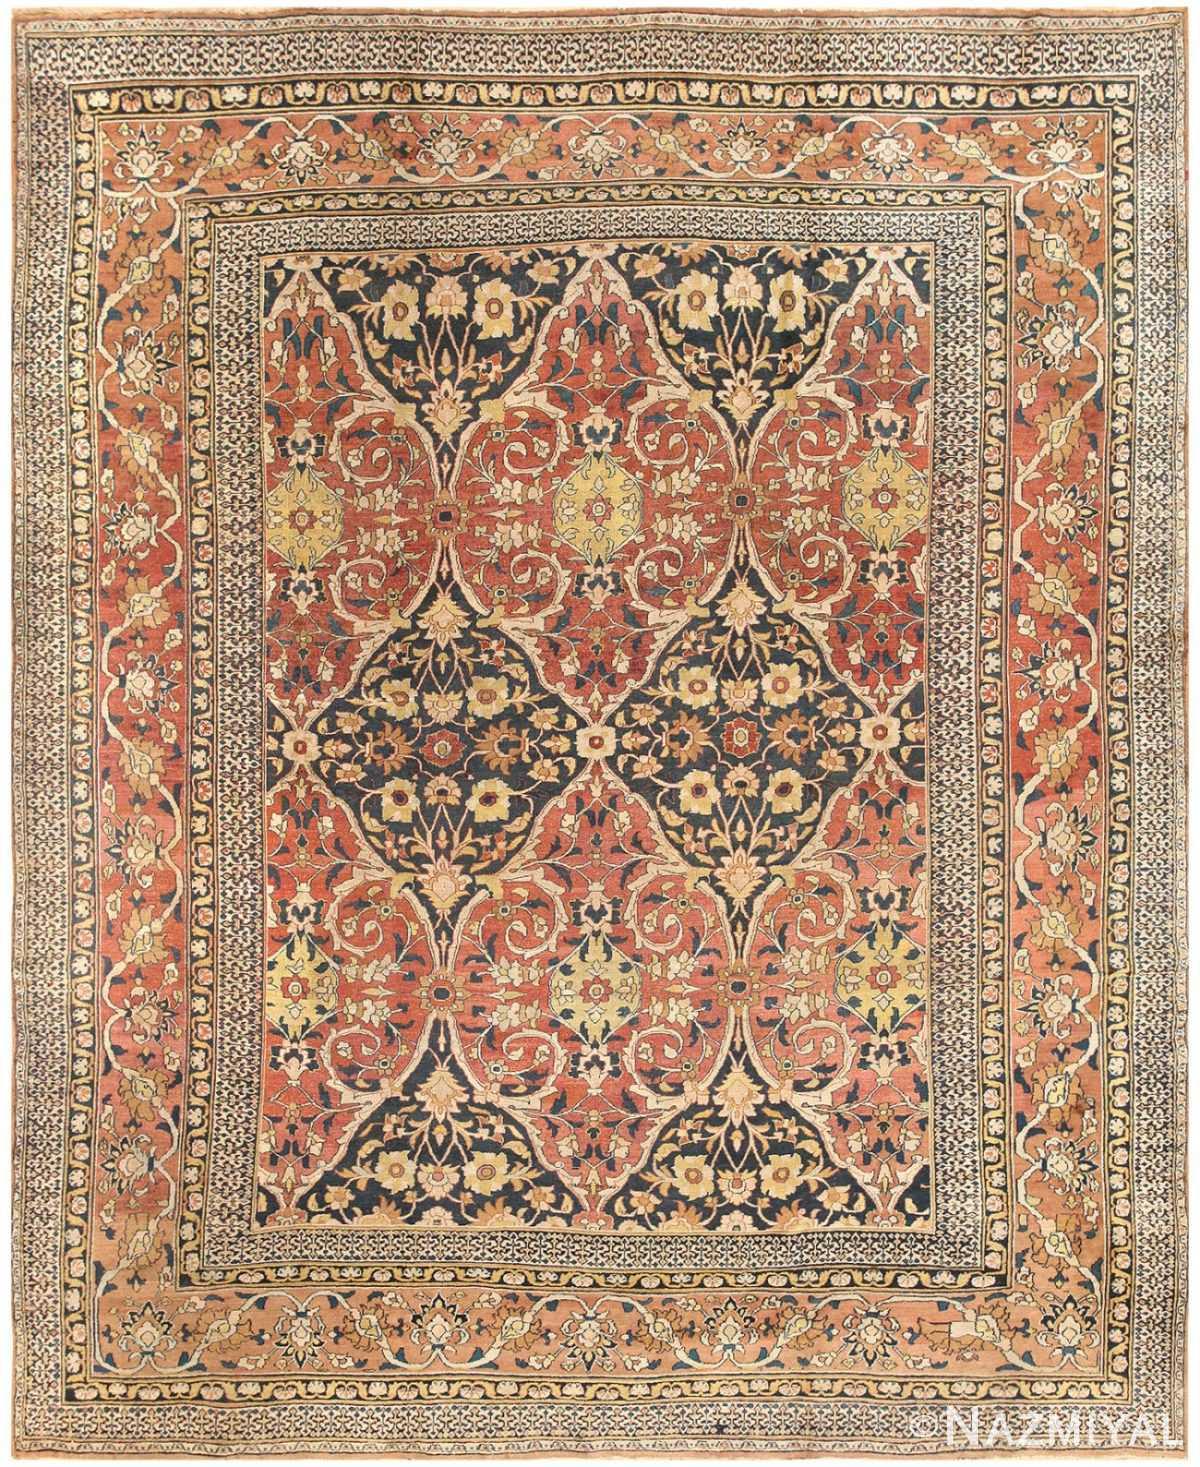 Antique Room Sized Persian Khorassan Carpet 50243 Nazmiyal